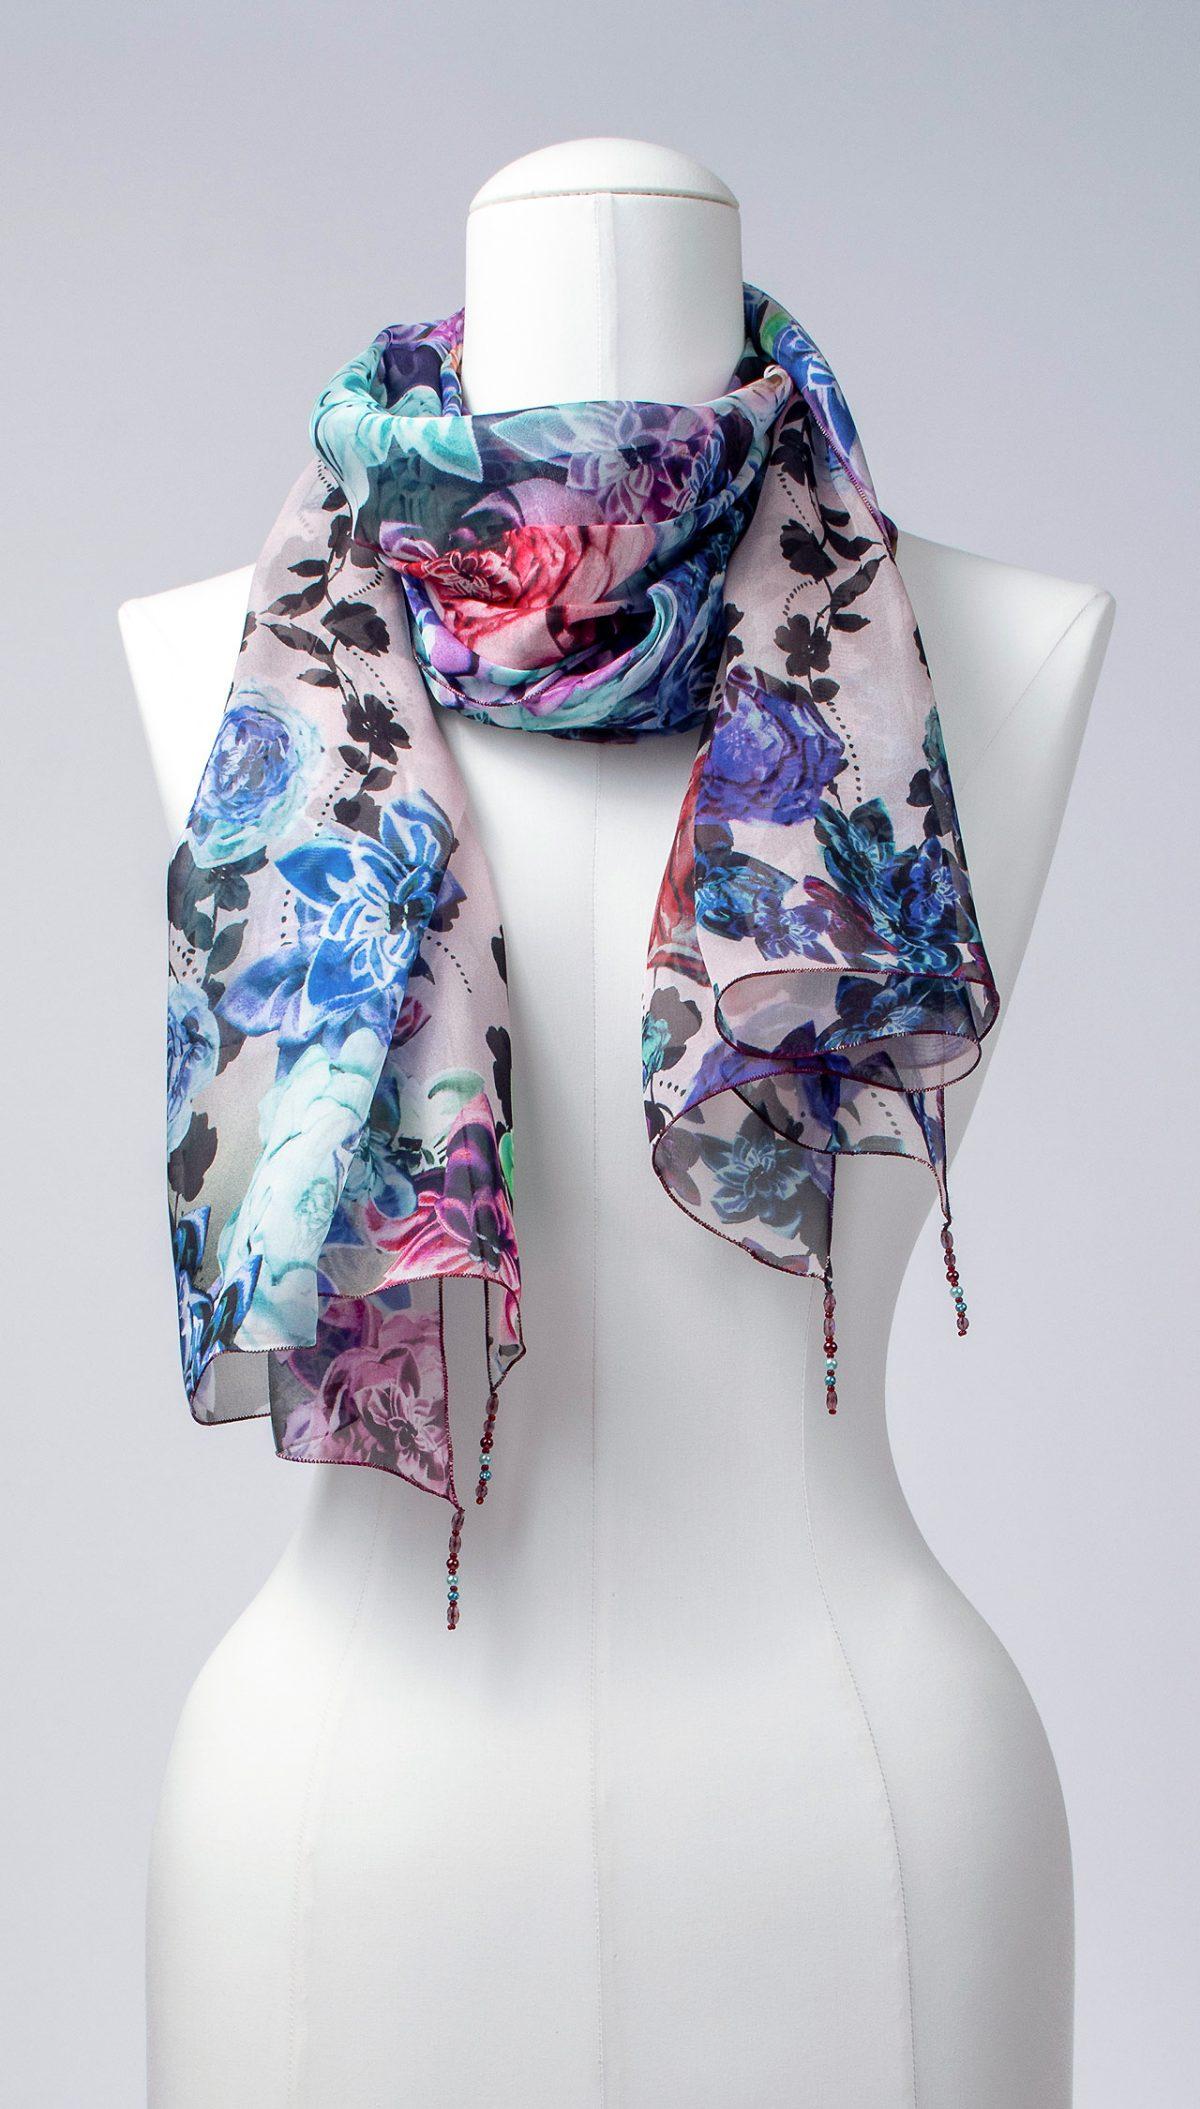 Seidenschal, lang, florales Design